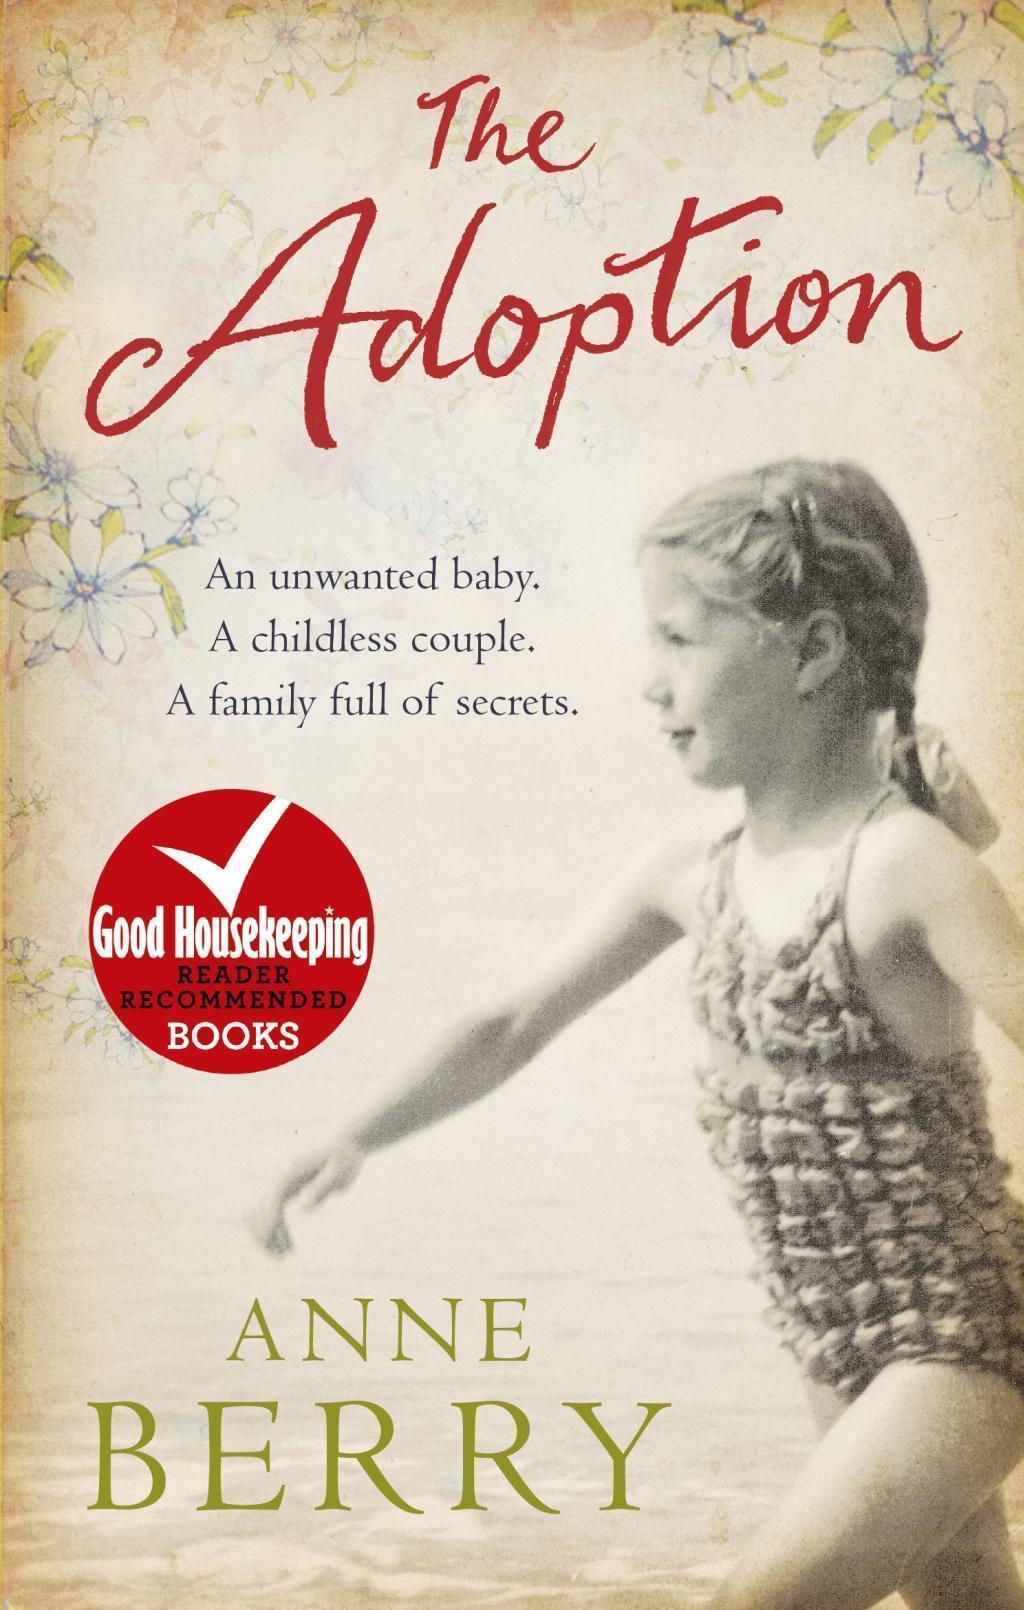 The Adoption